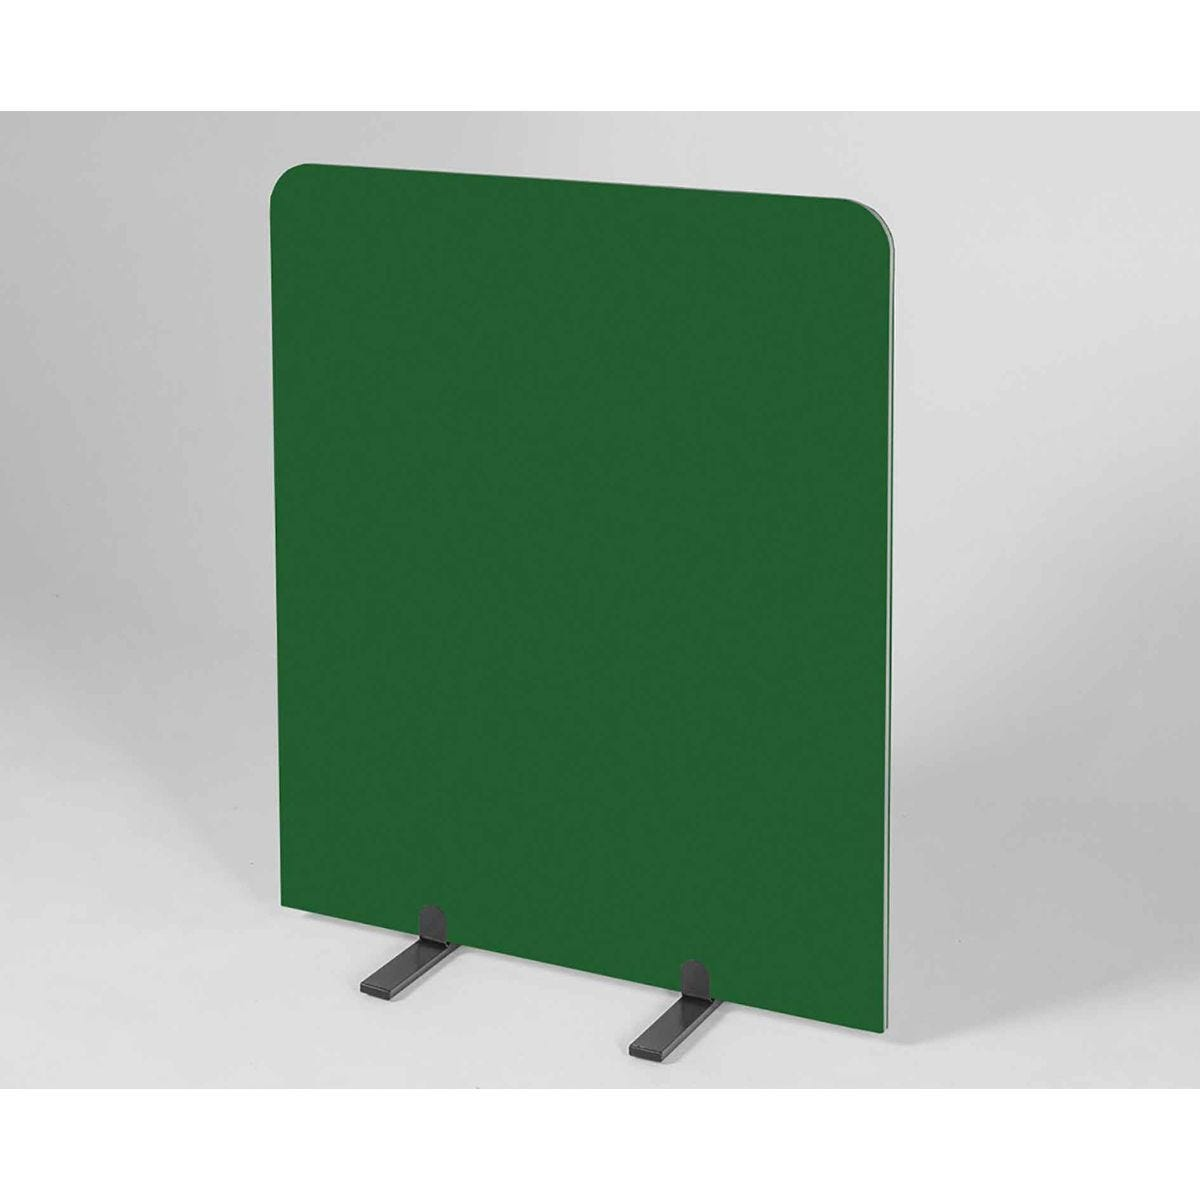 Metroplan BusyScreen Curve Screen 1200 x 1200mm Emerald